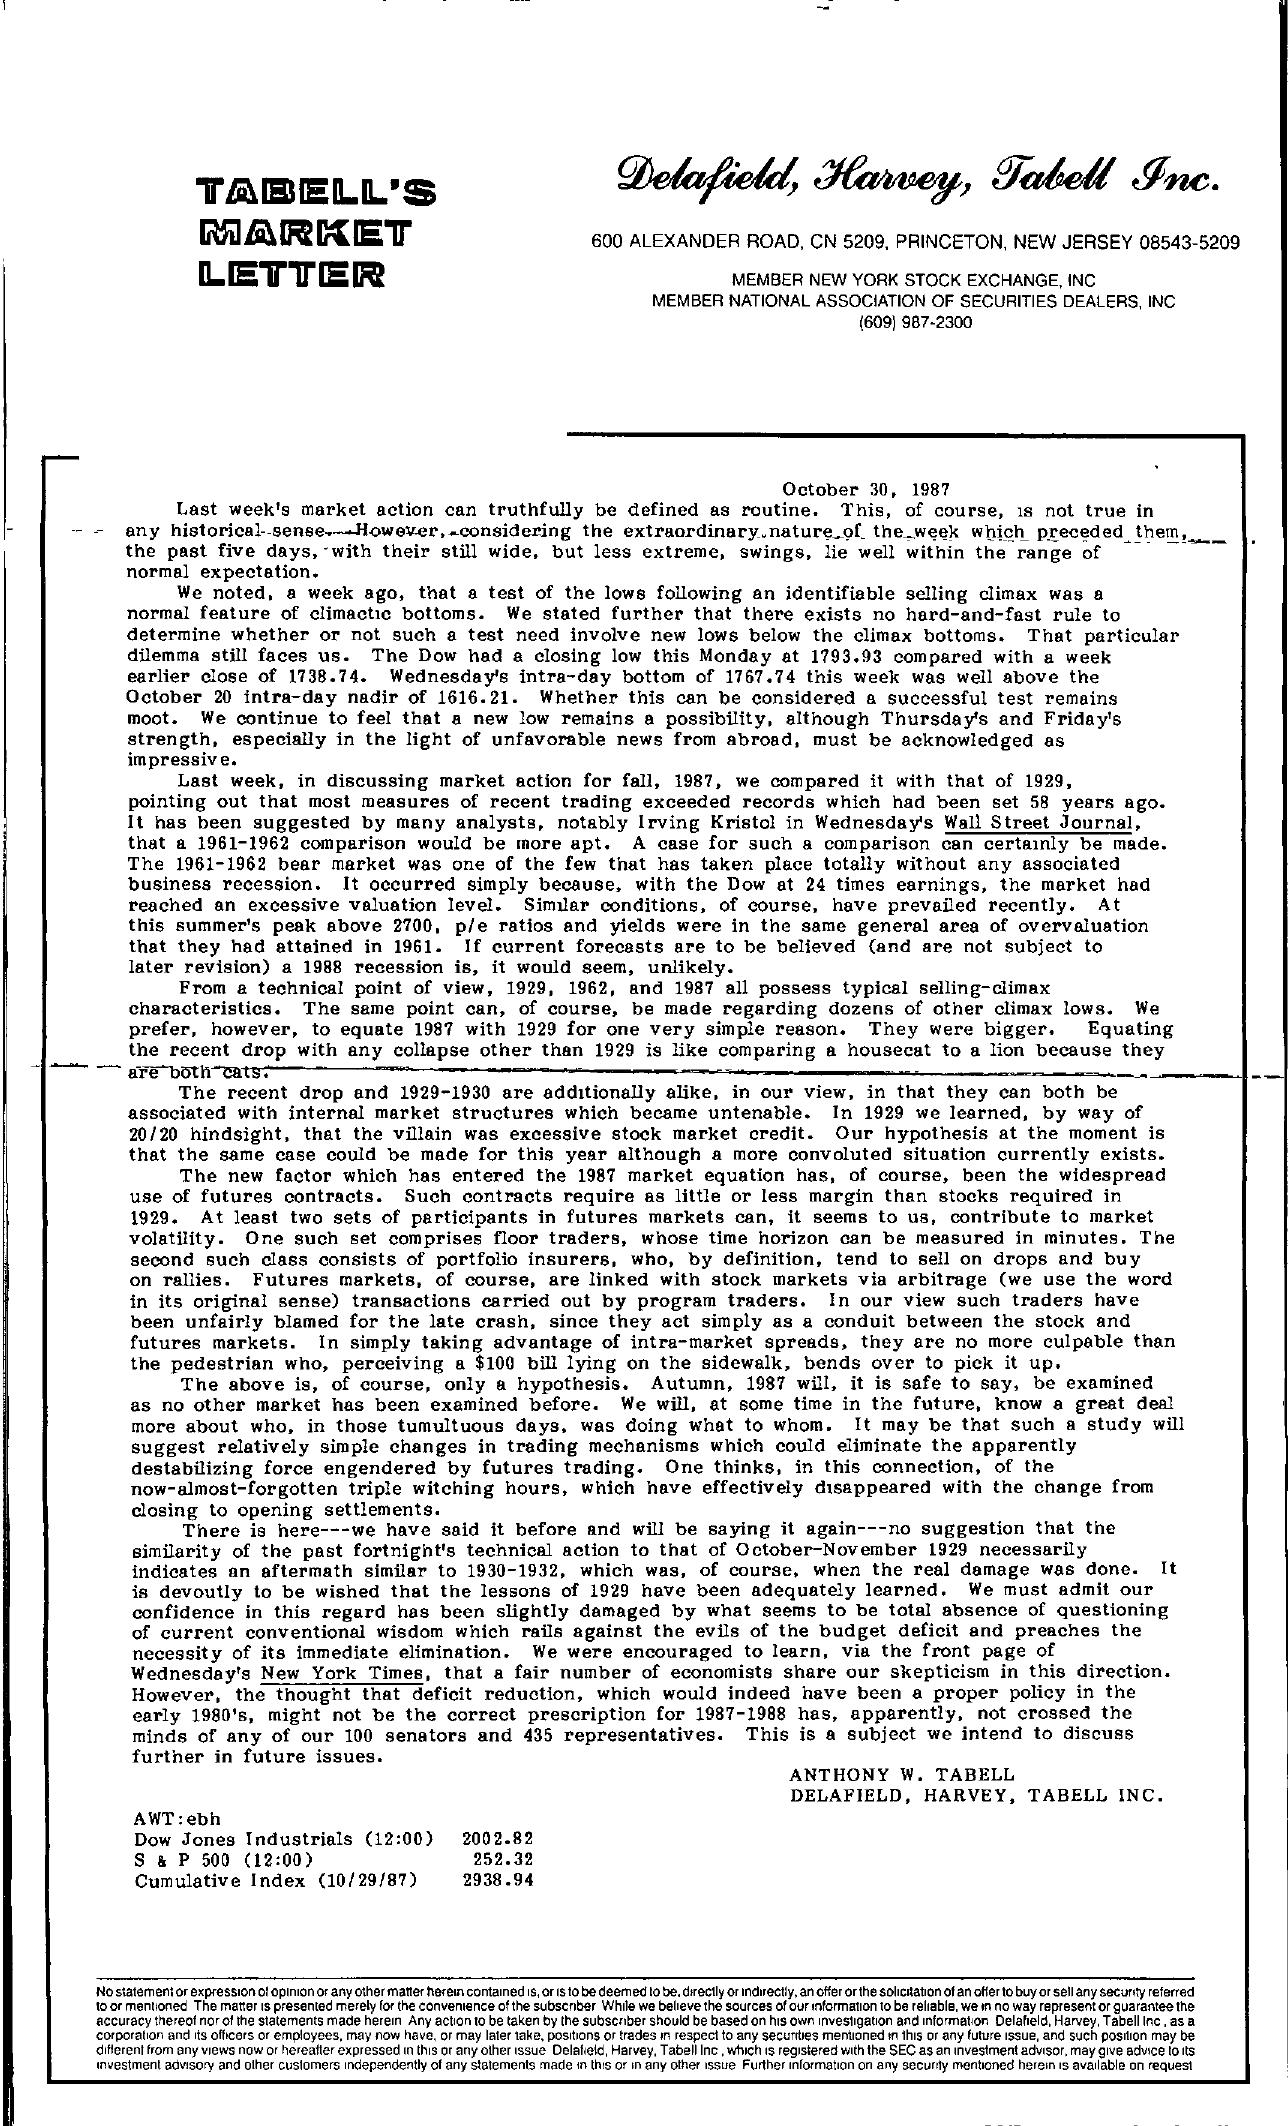 Tabell's Market Letter - October 30, 1987